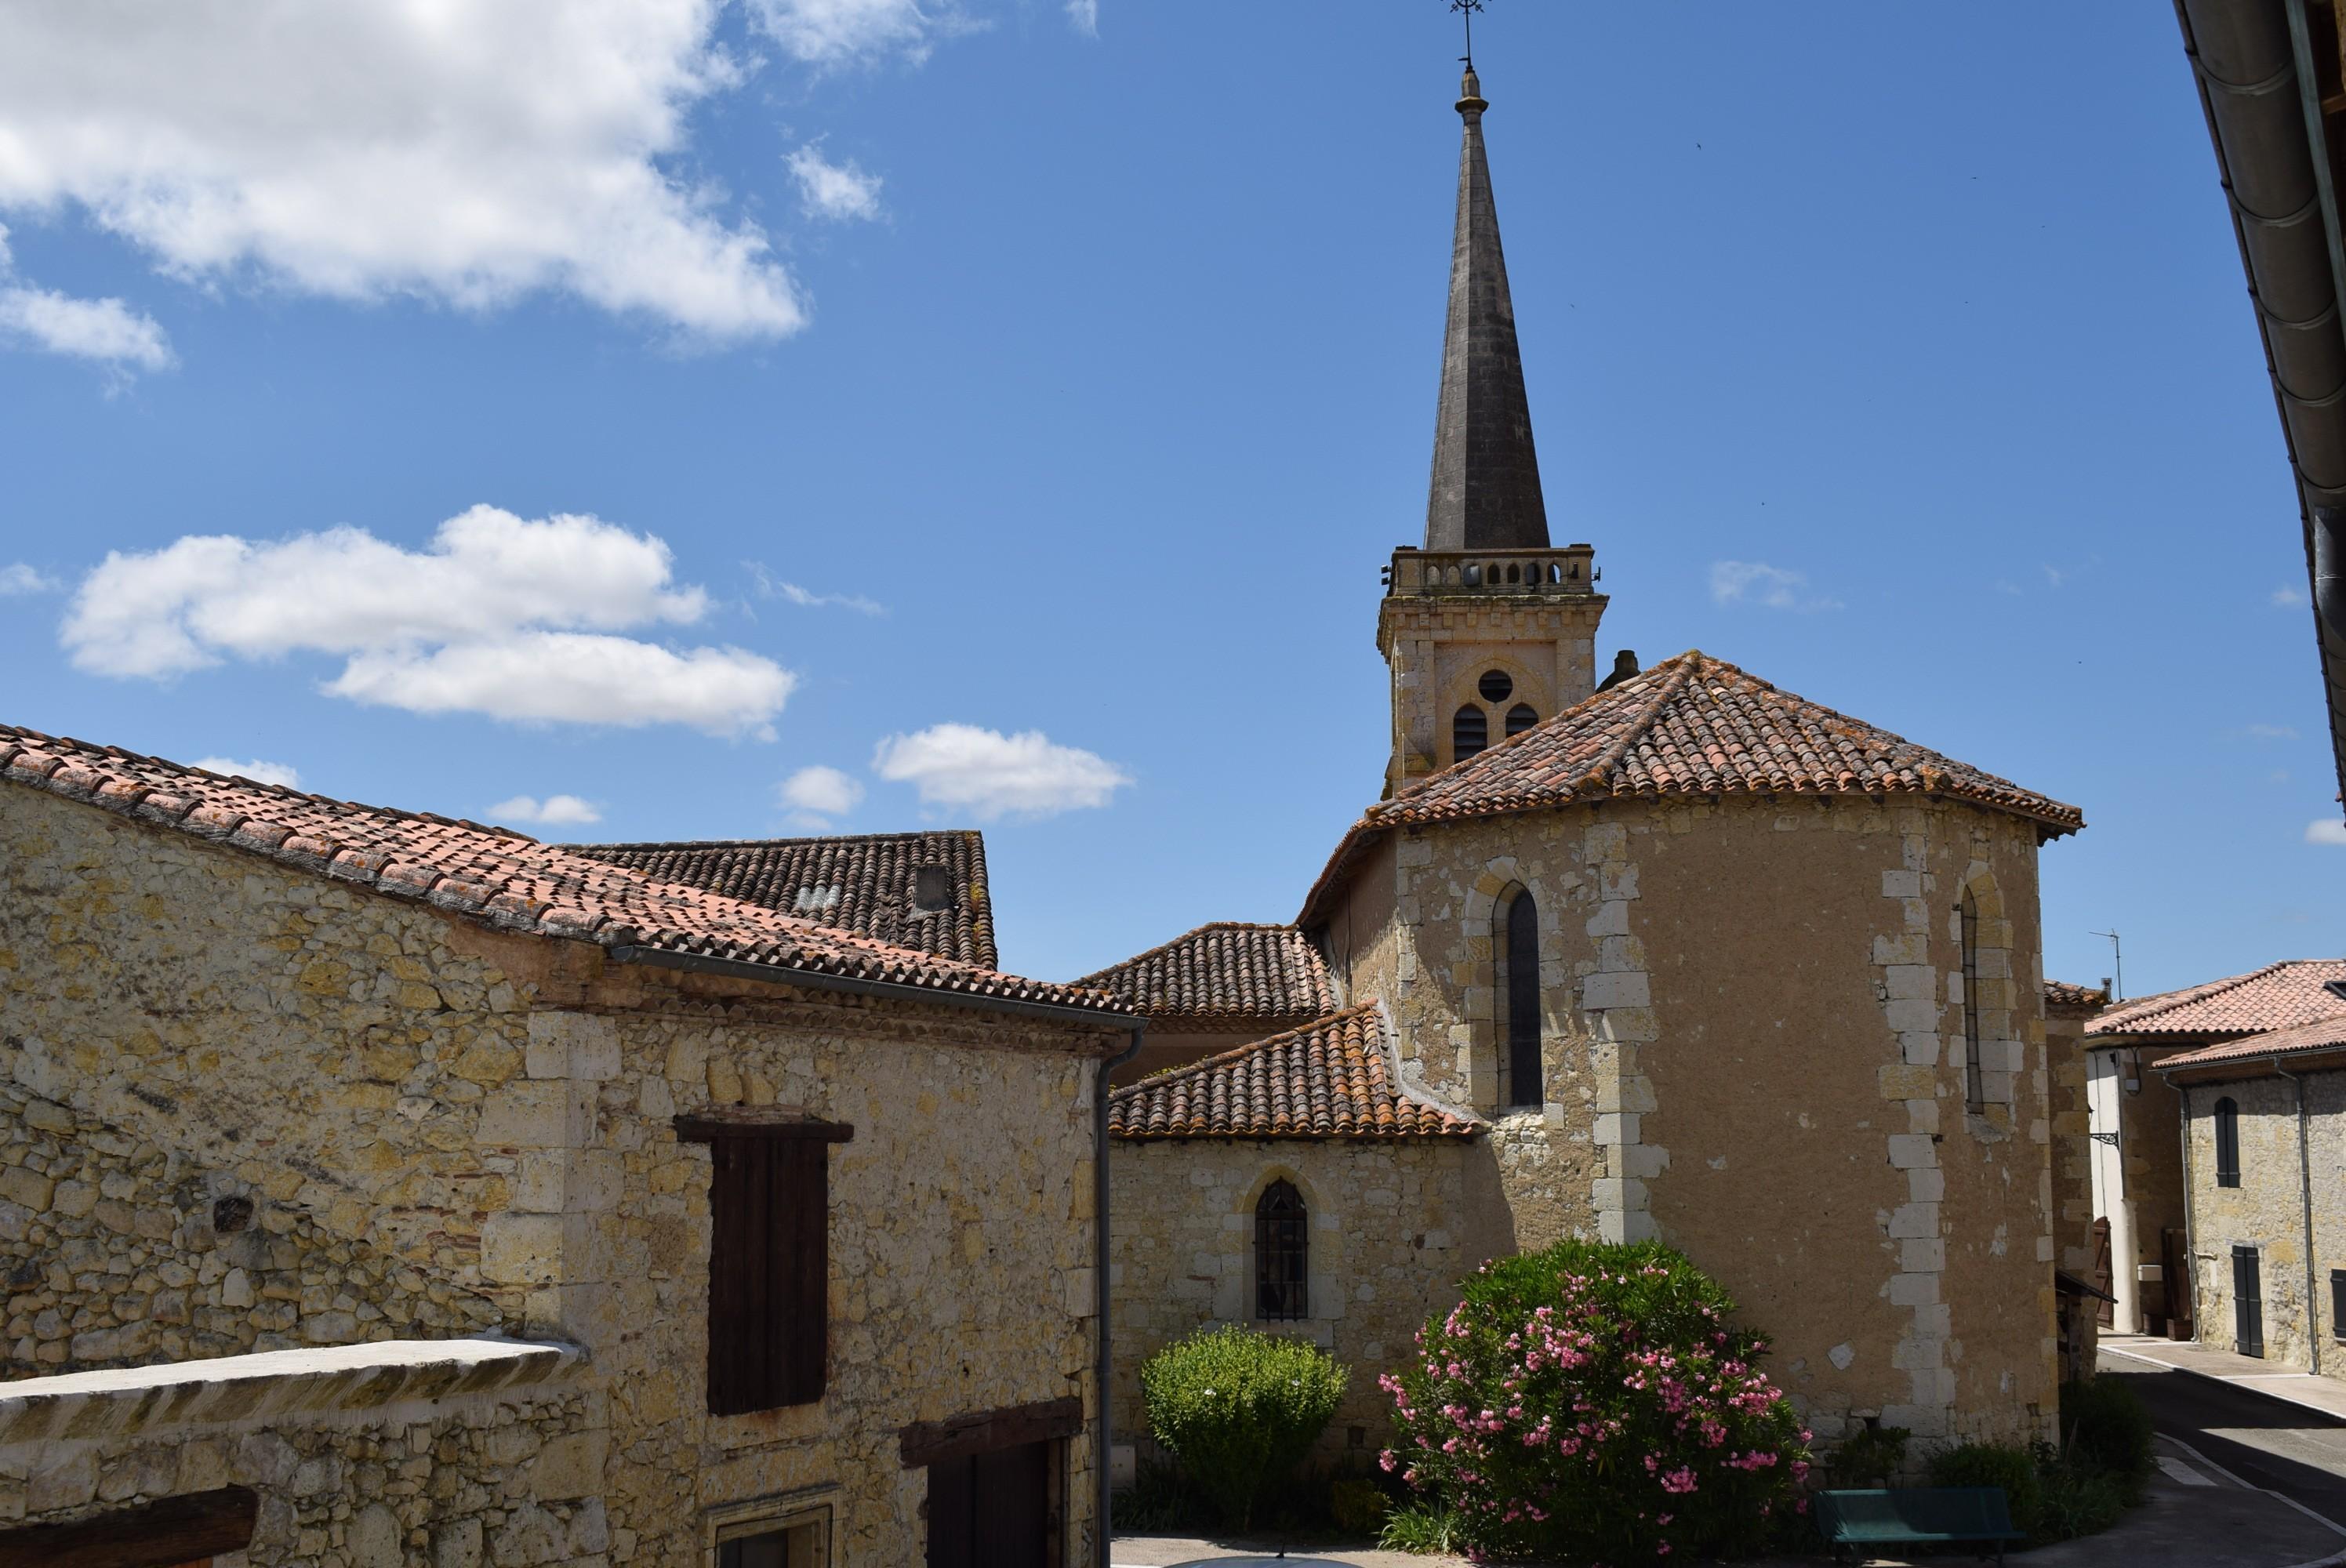 Castelnau d arbieu 28